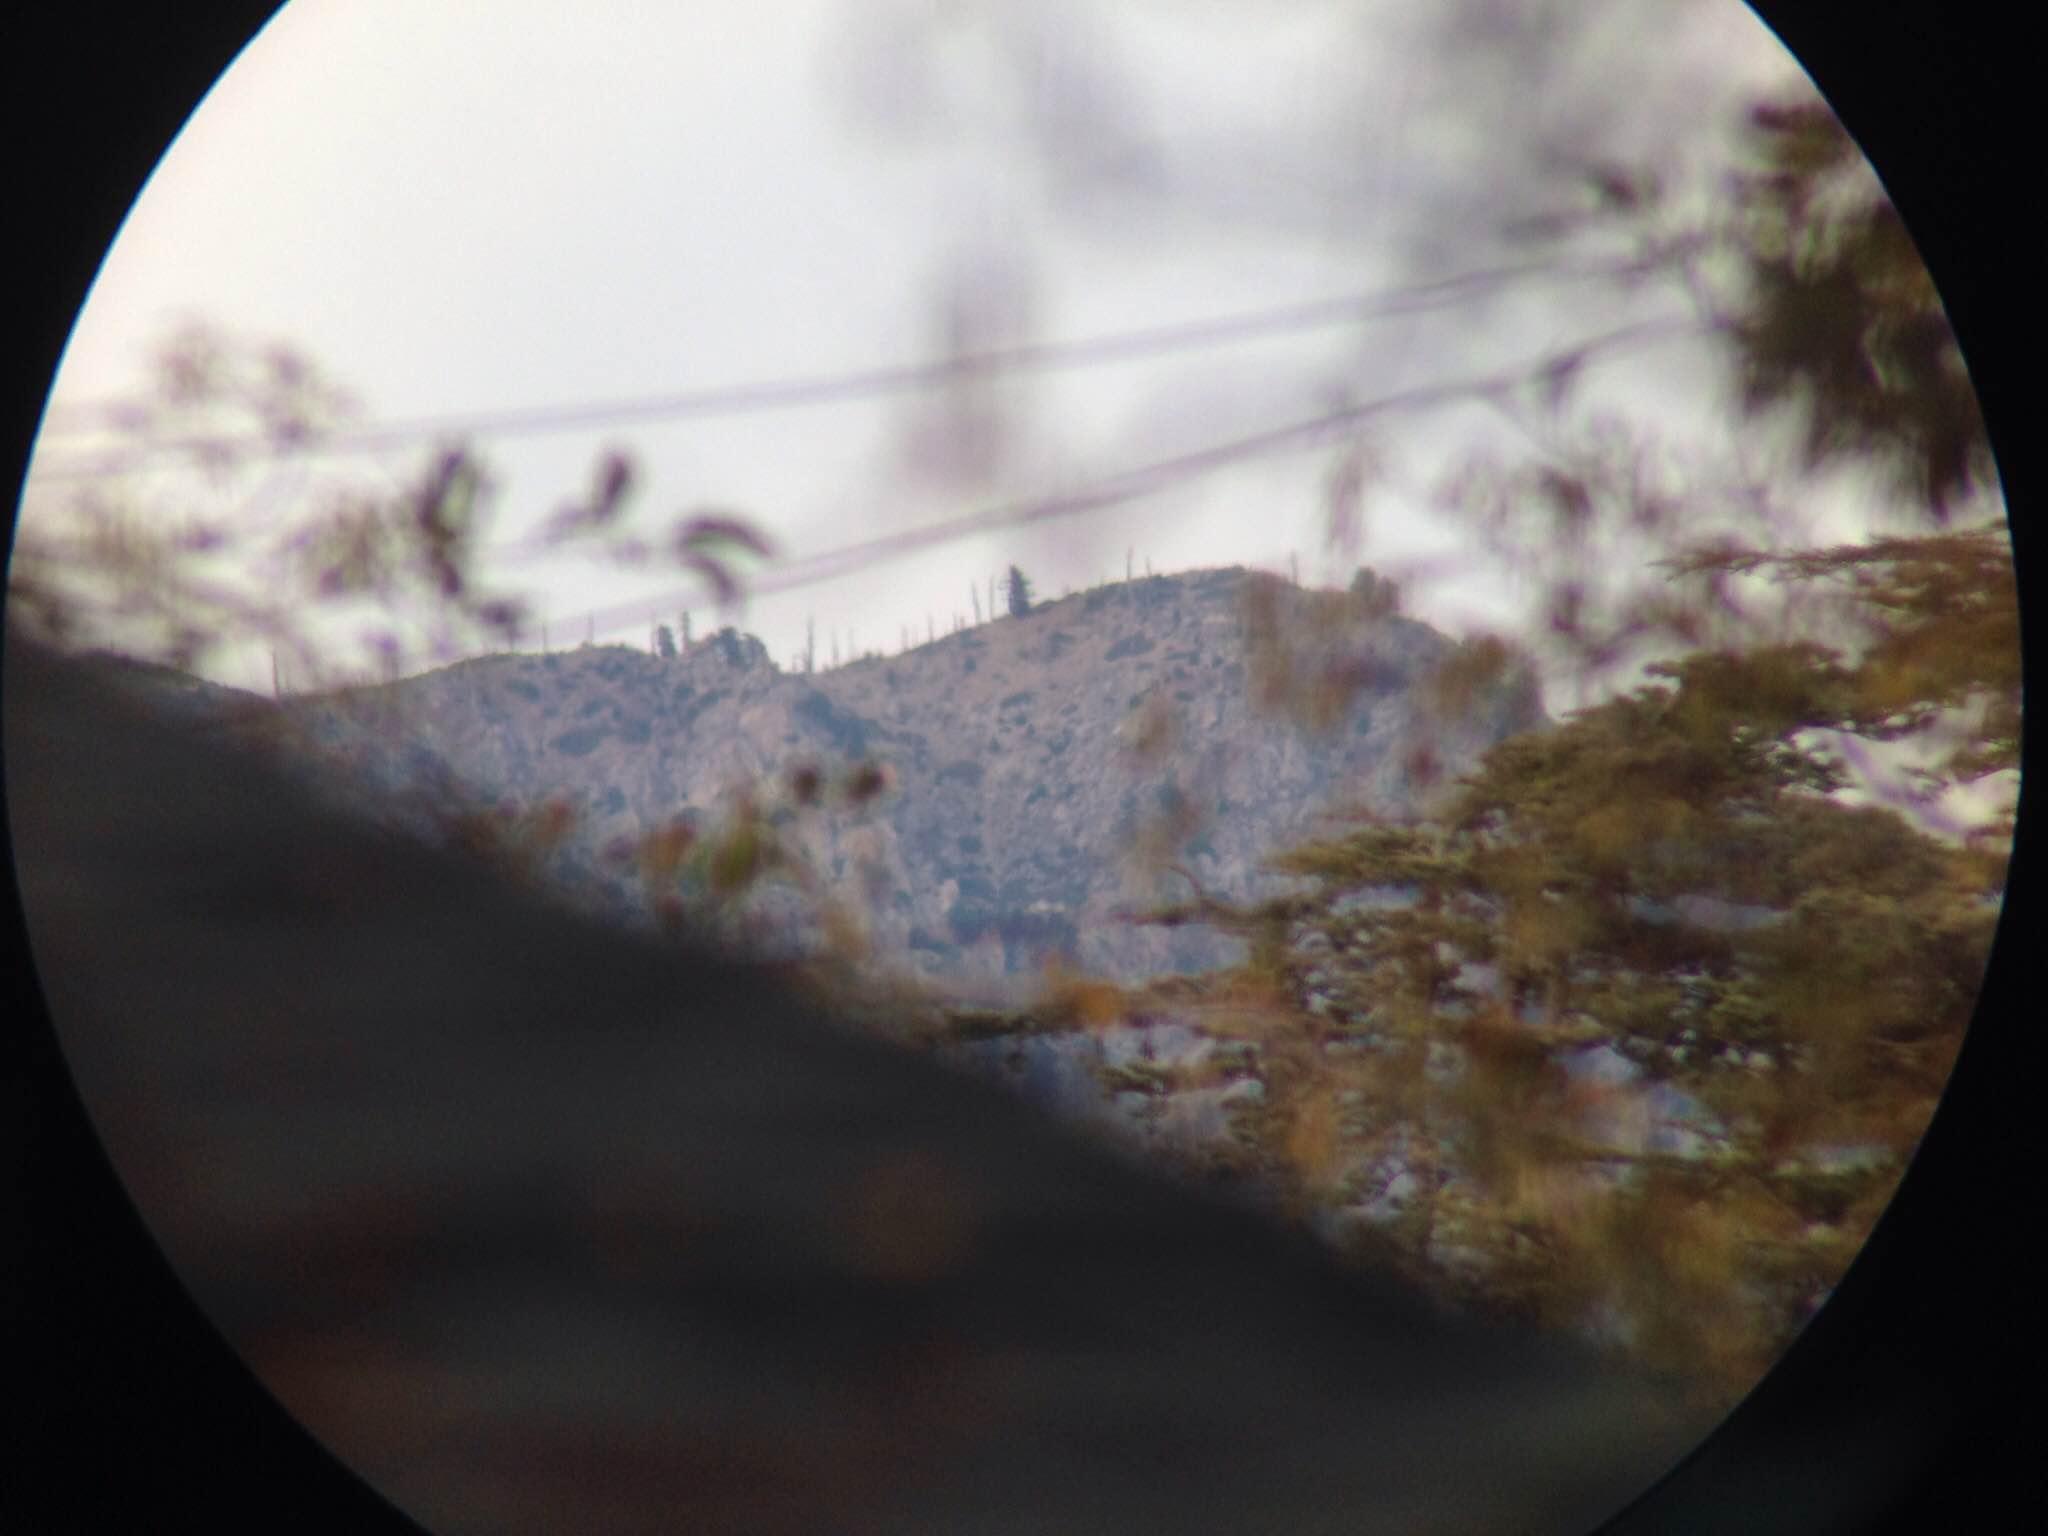 Mountains at 45x